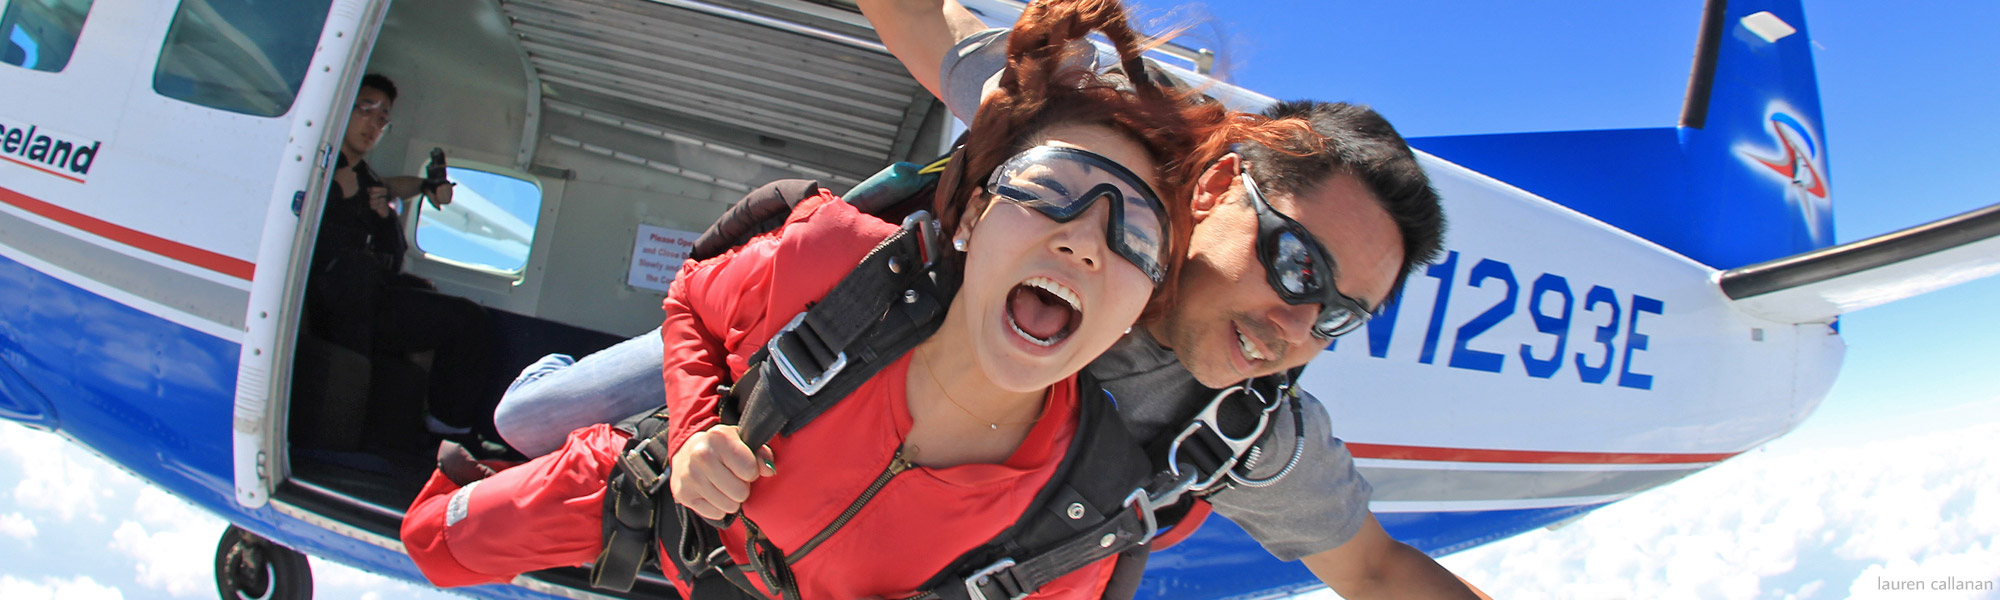 Your First Jump: Tandem Skydiving! - Skydive Spaceland San